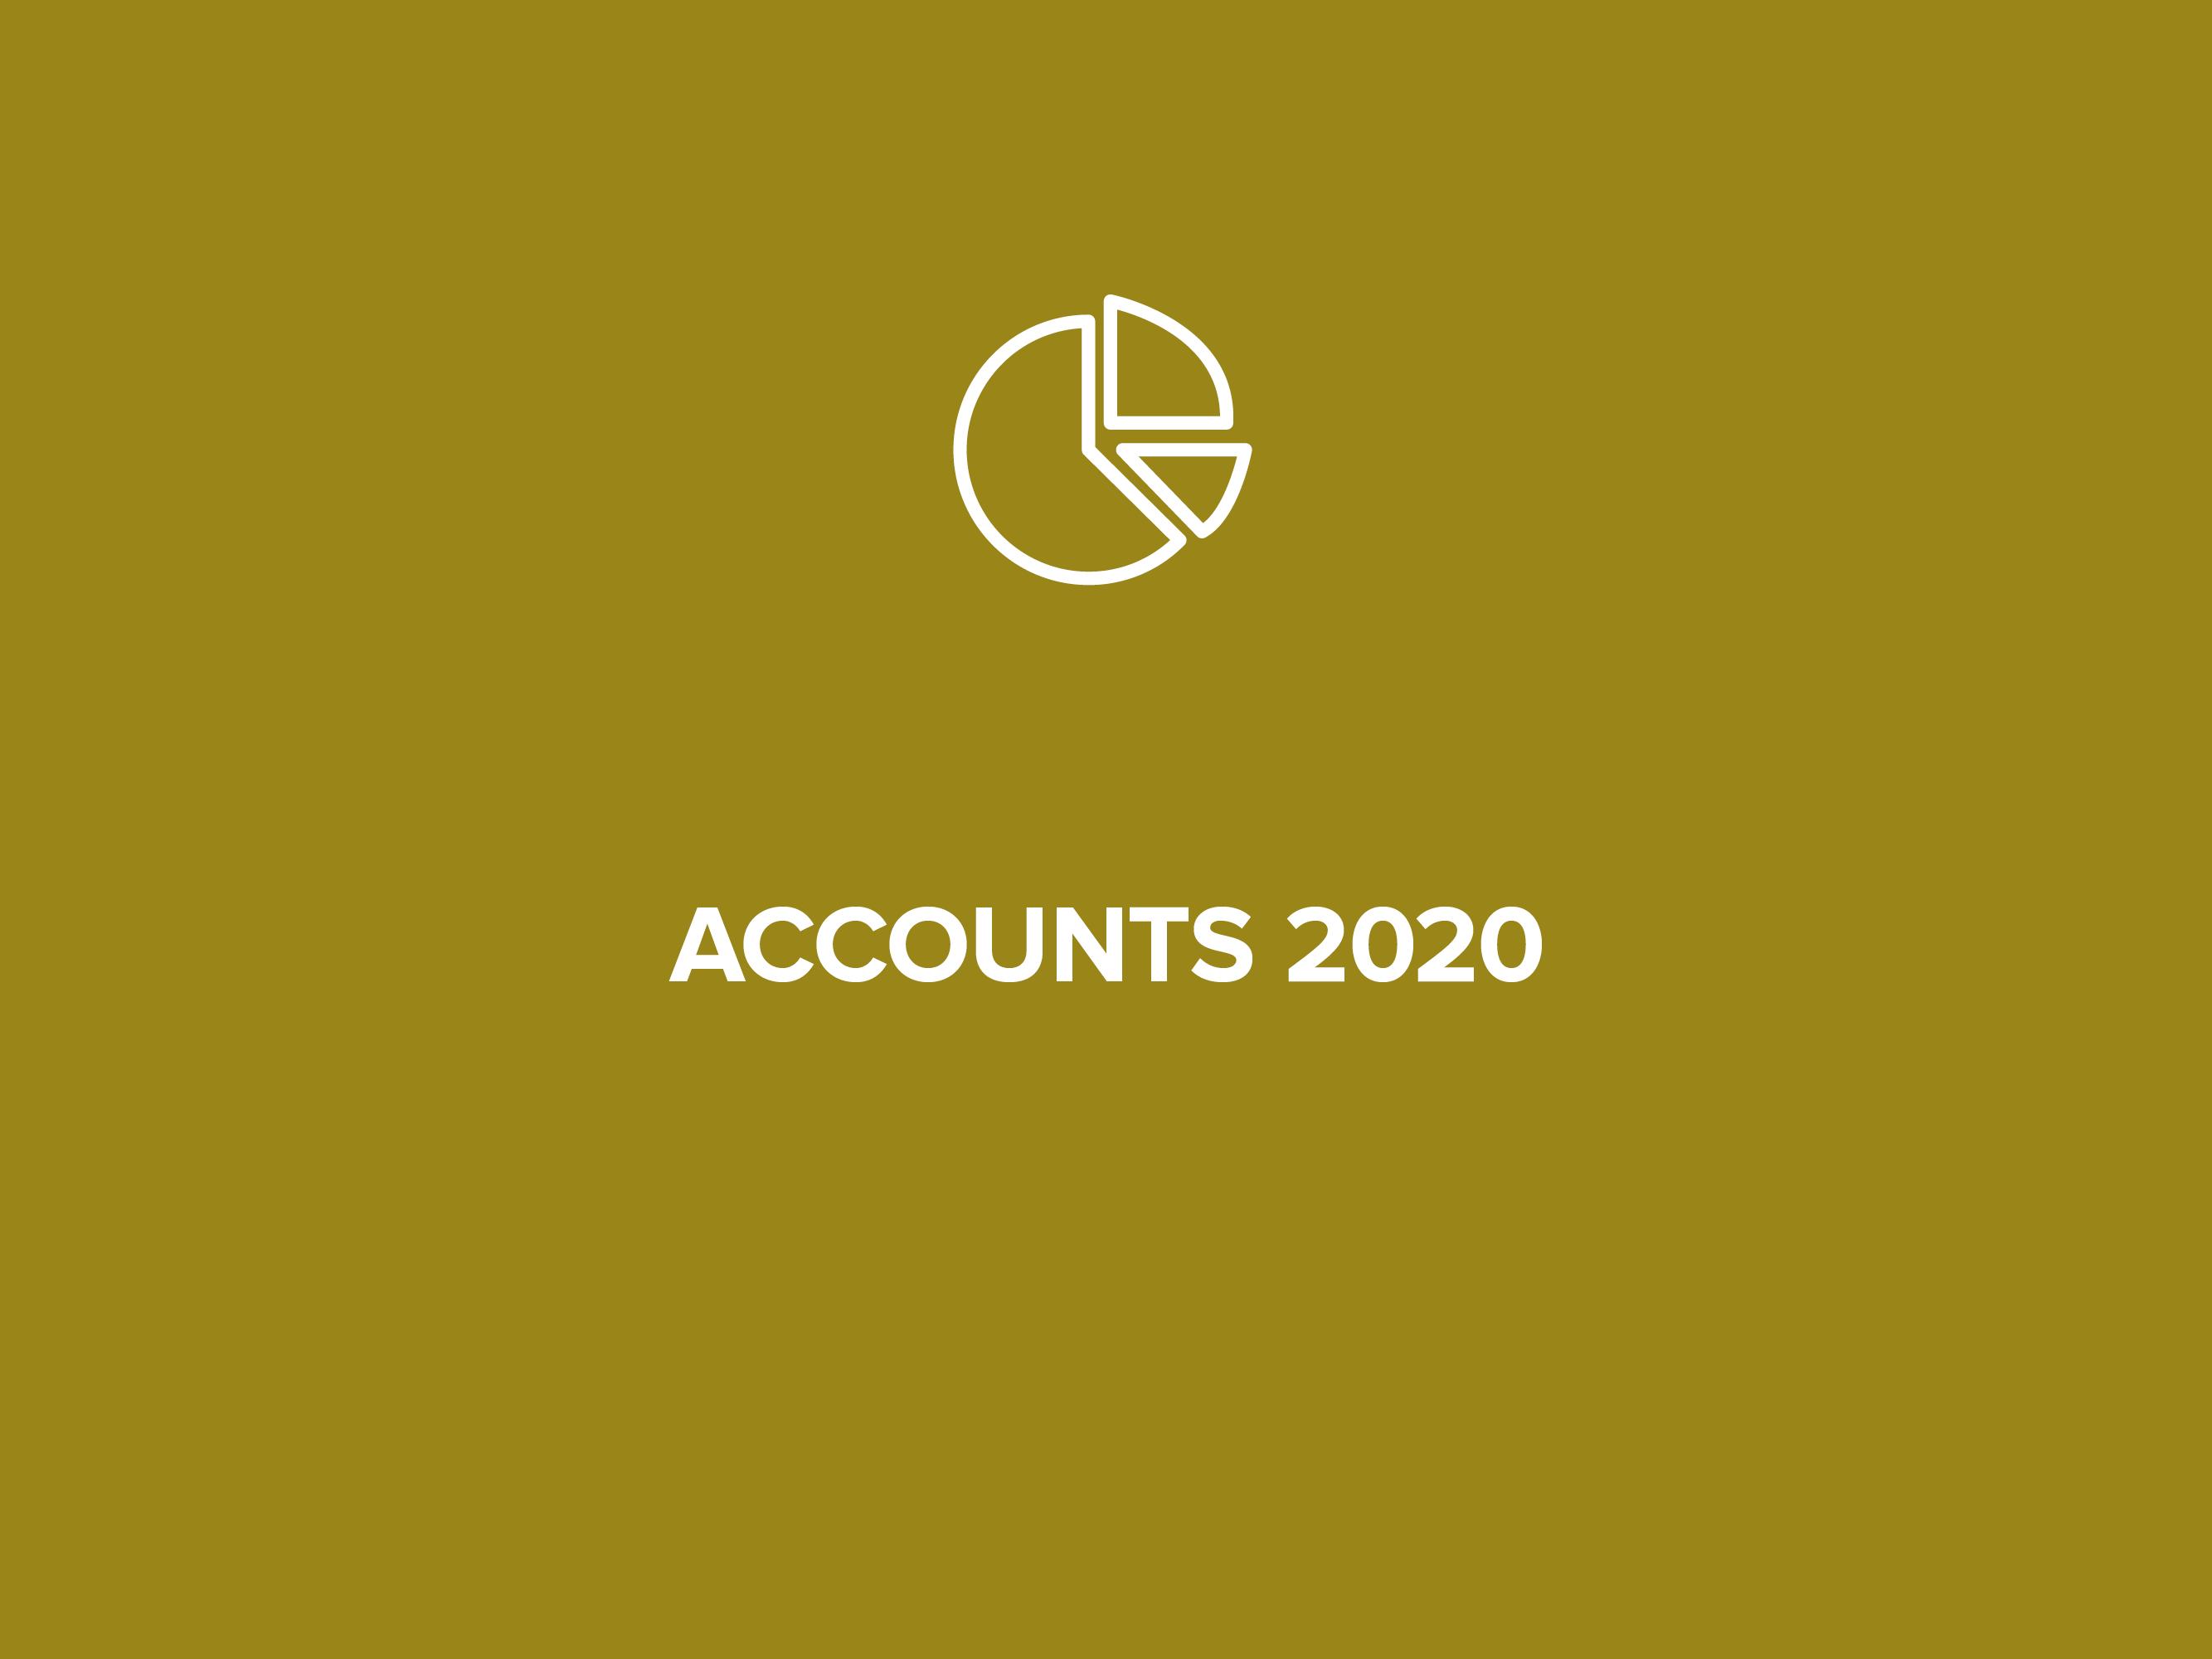 Accounts 2020